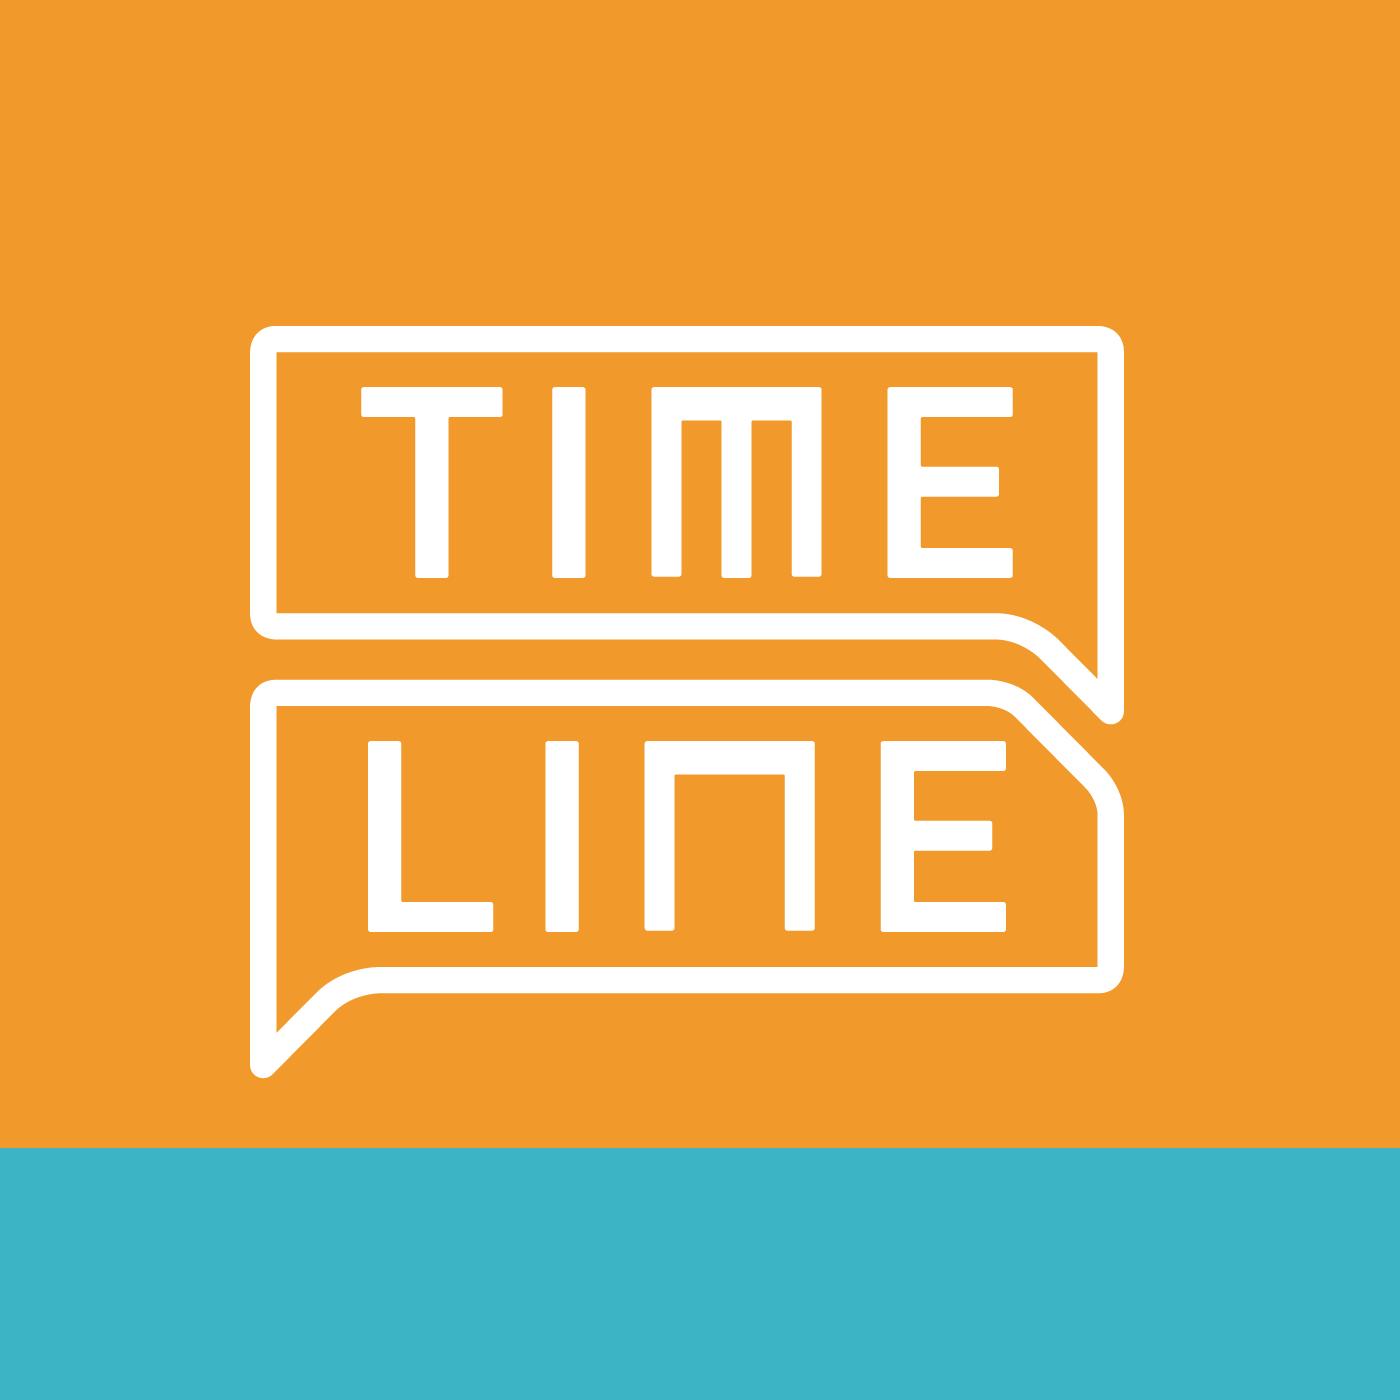 Timeline Gaúcha 26/06/2017